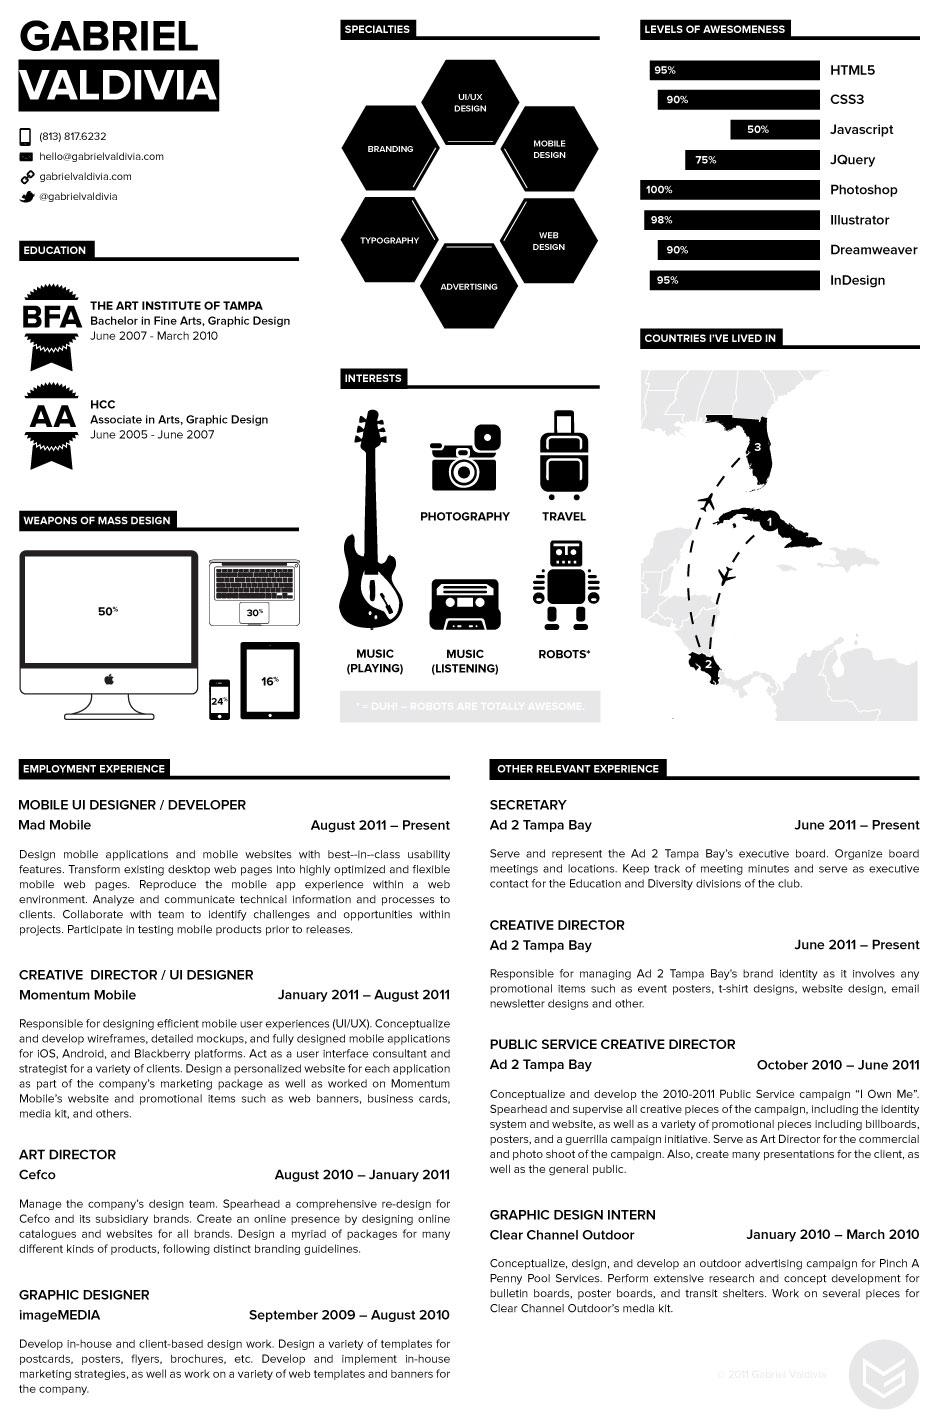 Resume by Gabriel Valdivia